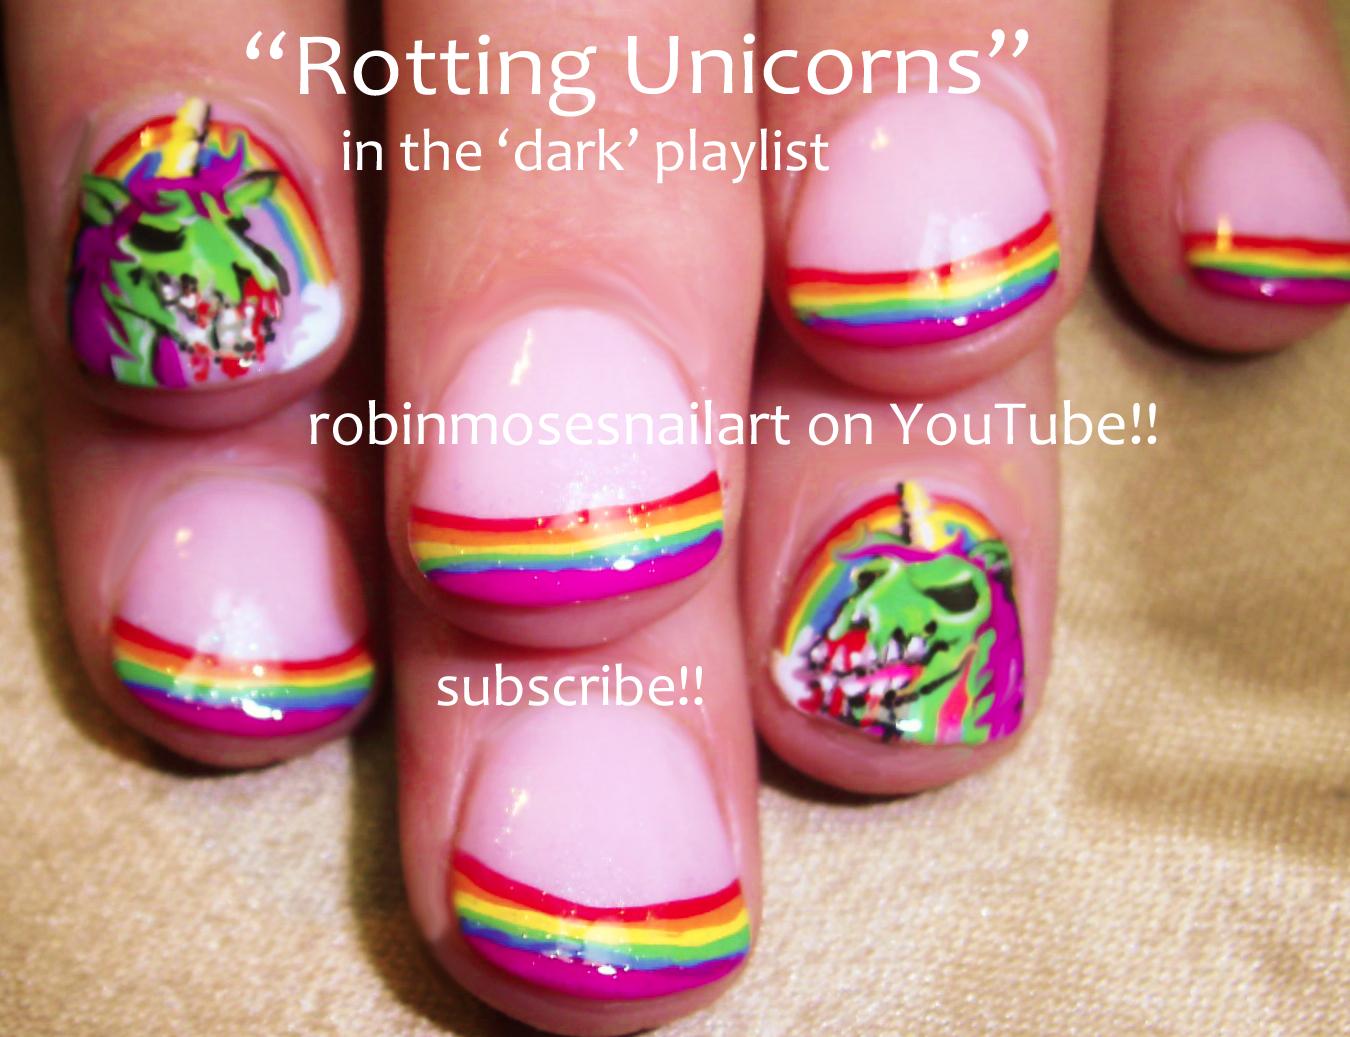 Zombie Unicorn Nails Rainbow Tip Nail Art Tutorial Evil Rotting Epic French